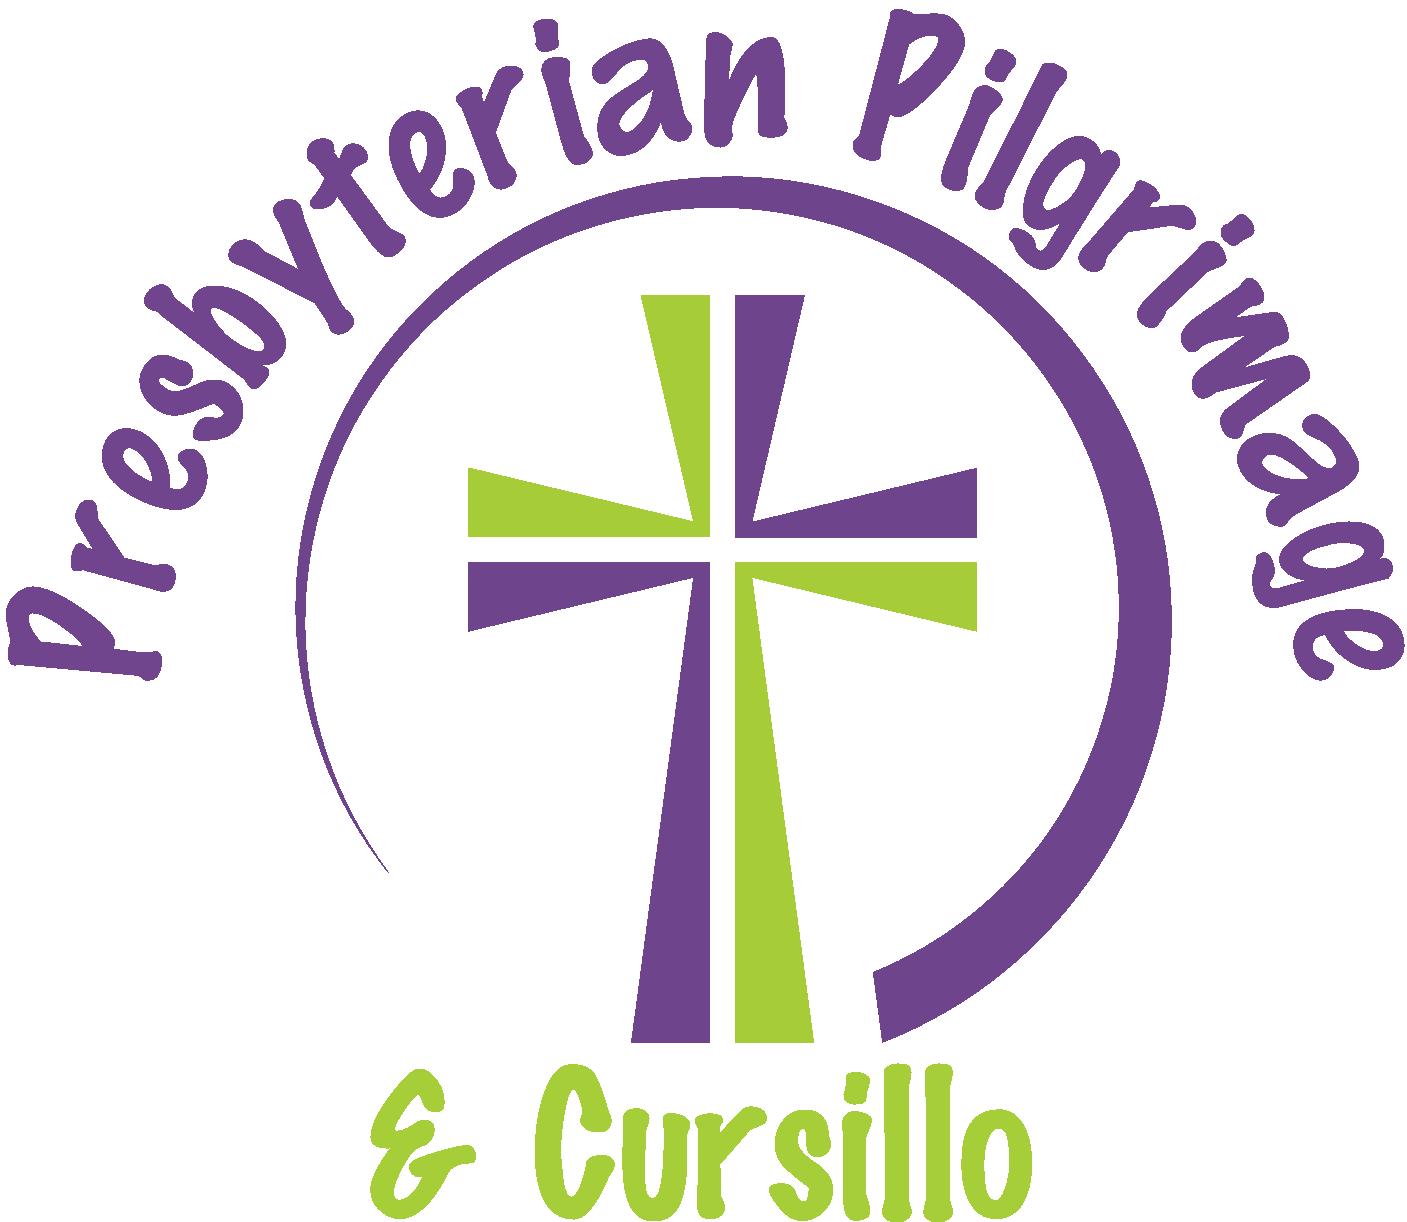 National Pilgrimage & Cursillo